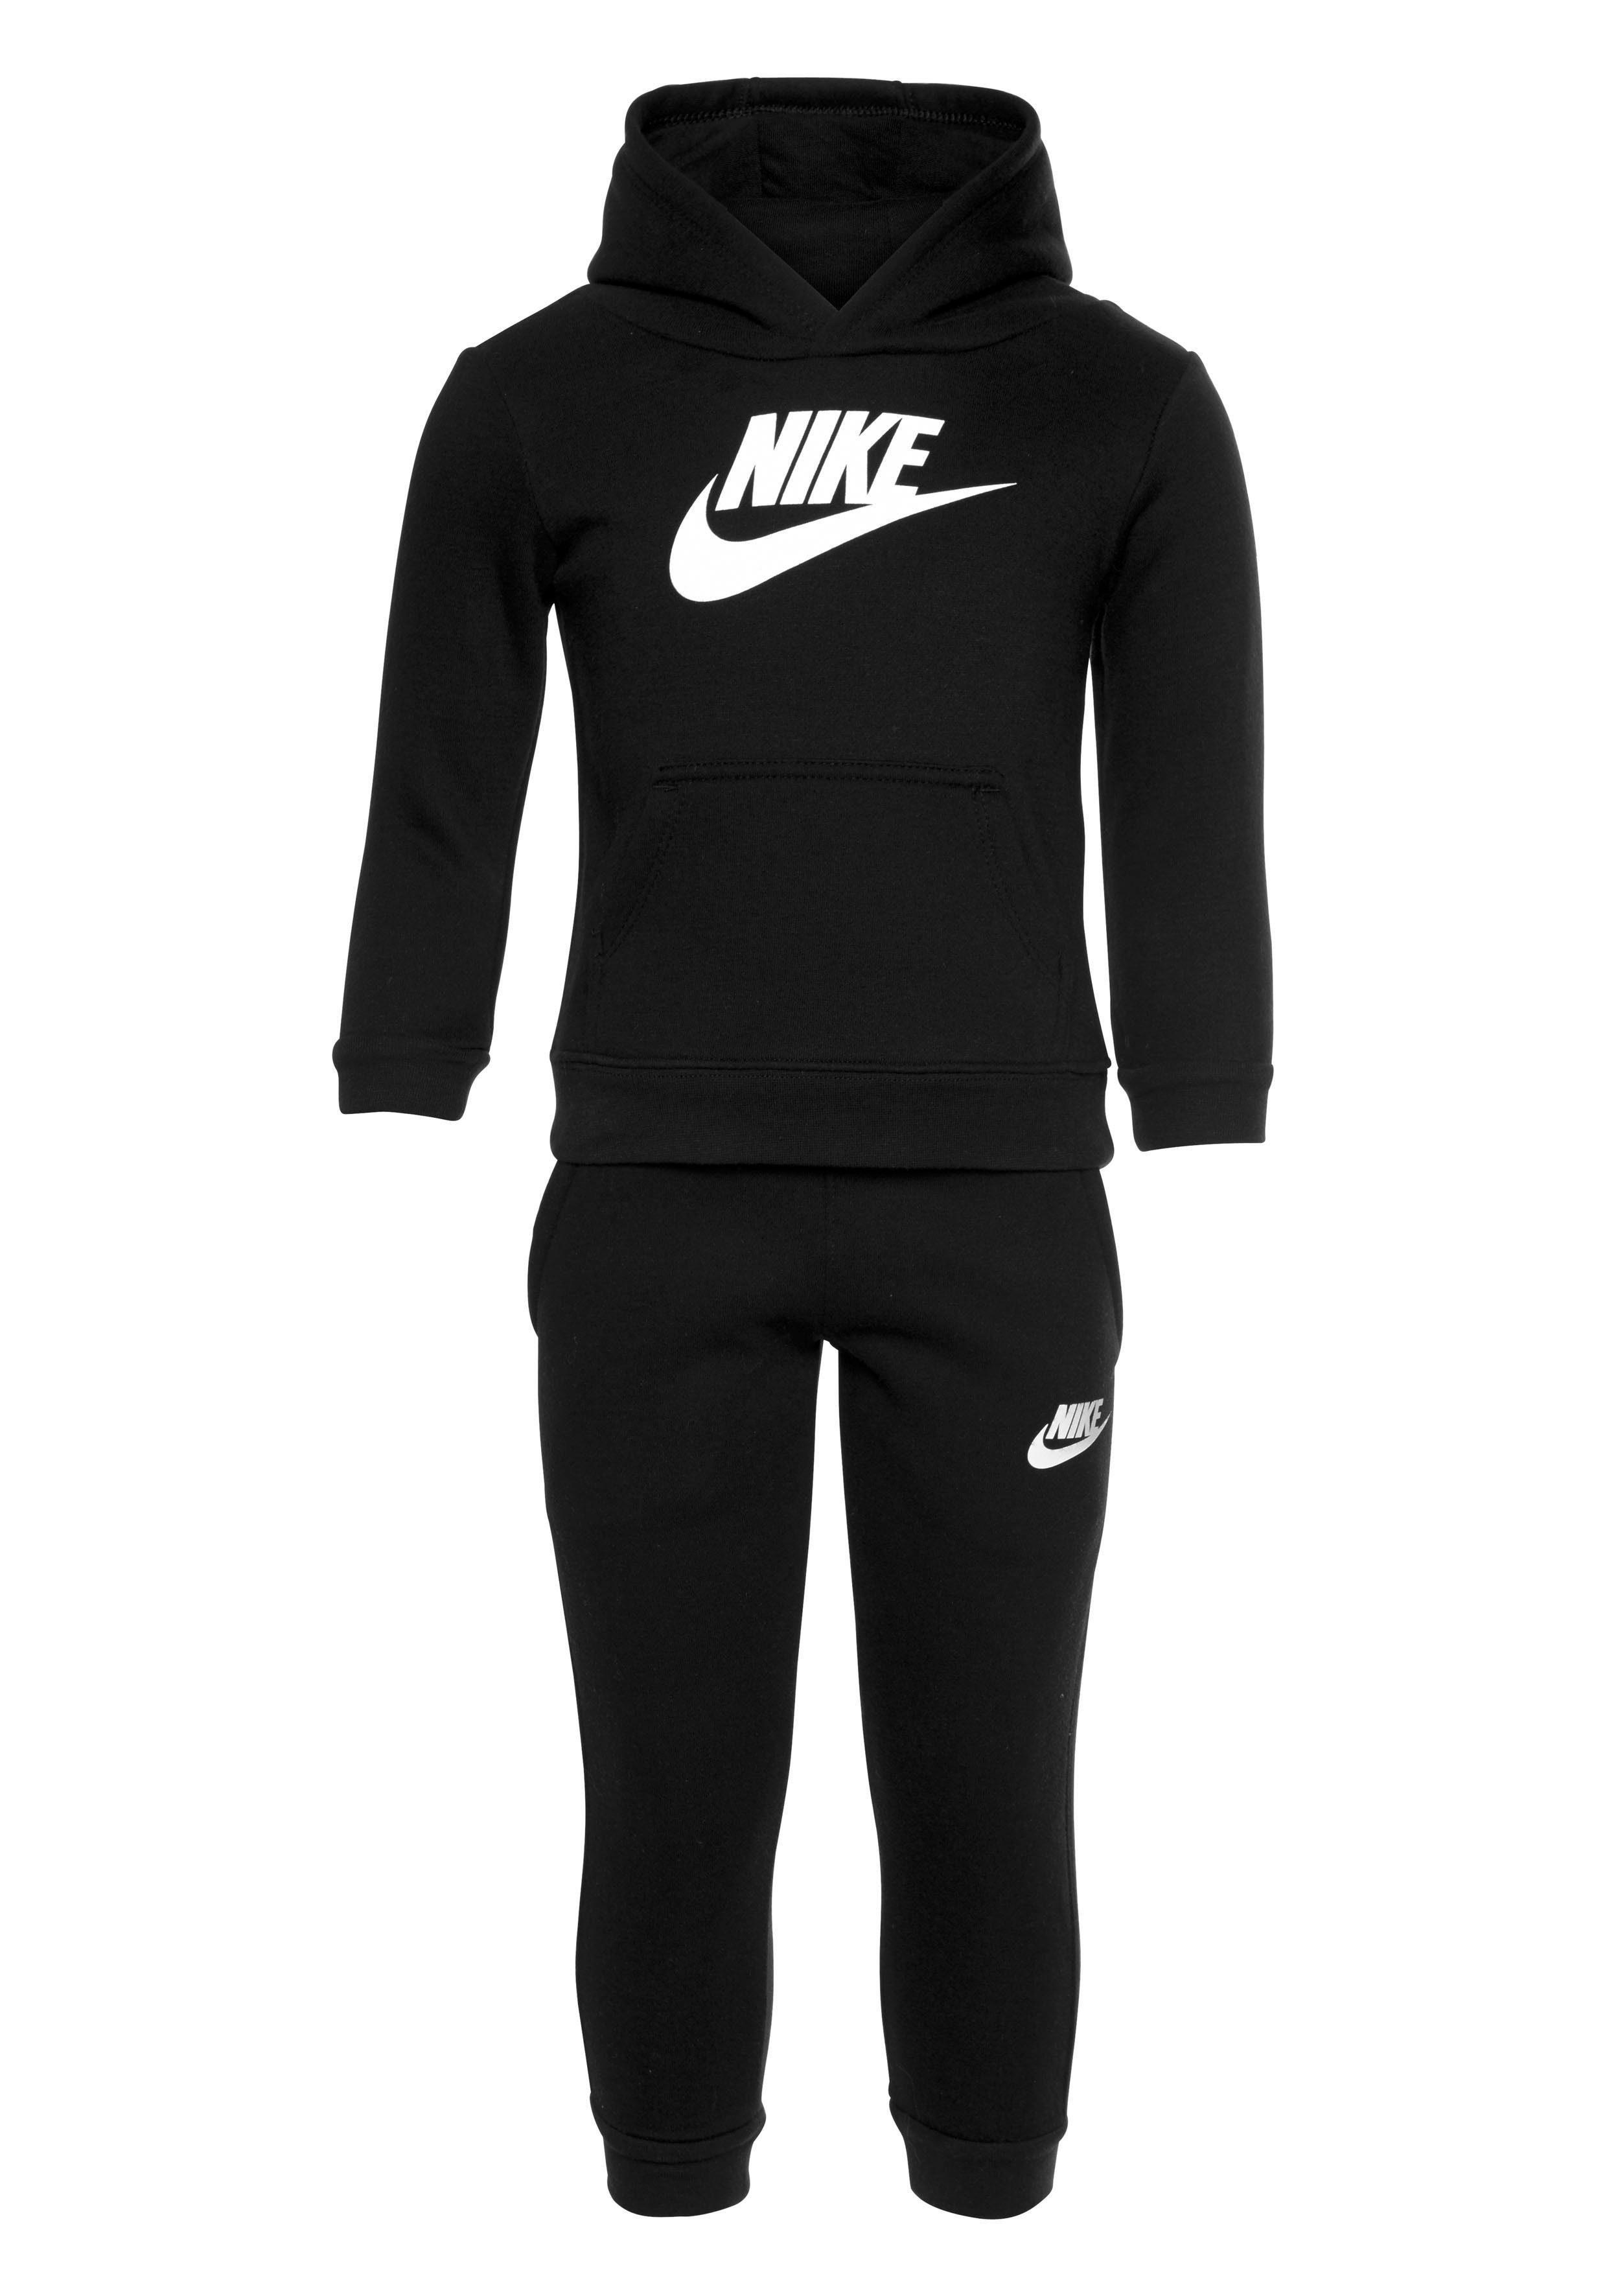 Nike Sportswear Jogginganzug »NIKE SPORTSWEAR CLUB FLEECE PO HOODIE PANT SET« (Set, 2 tlg) online kaufen | OTTO